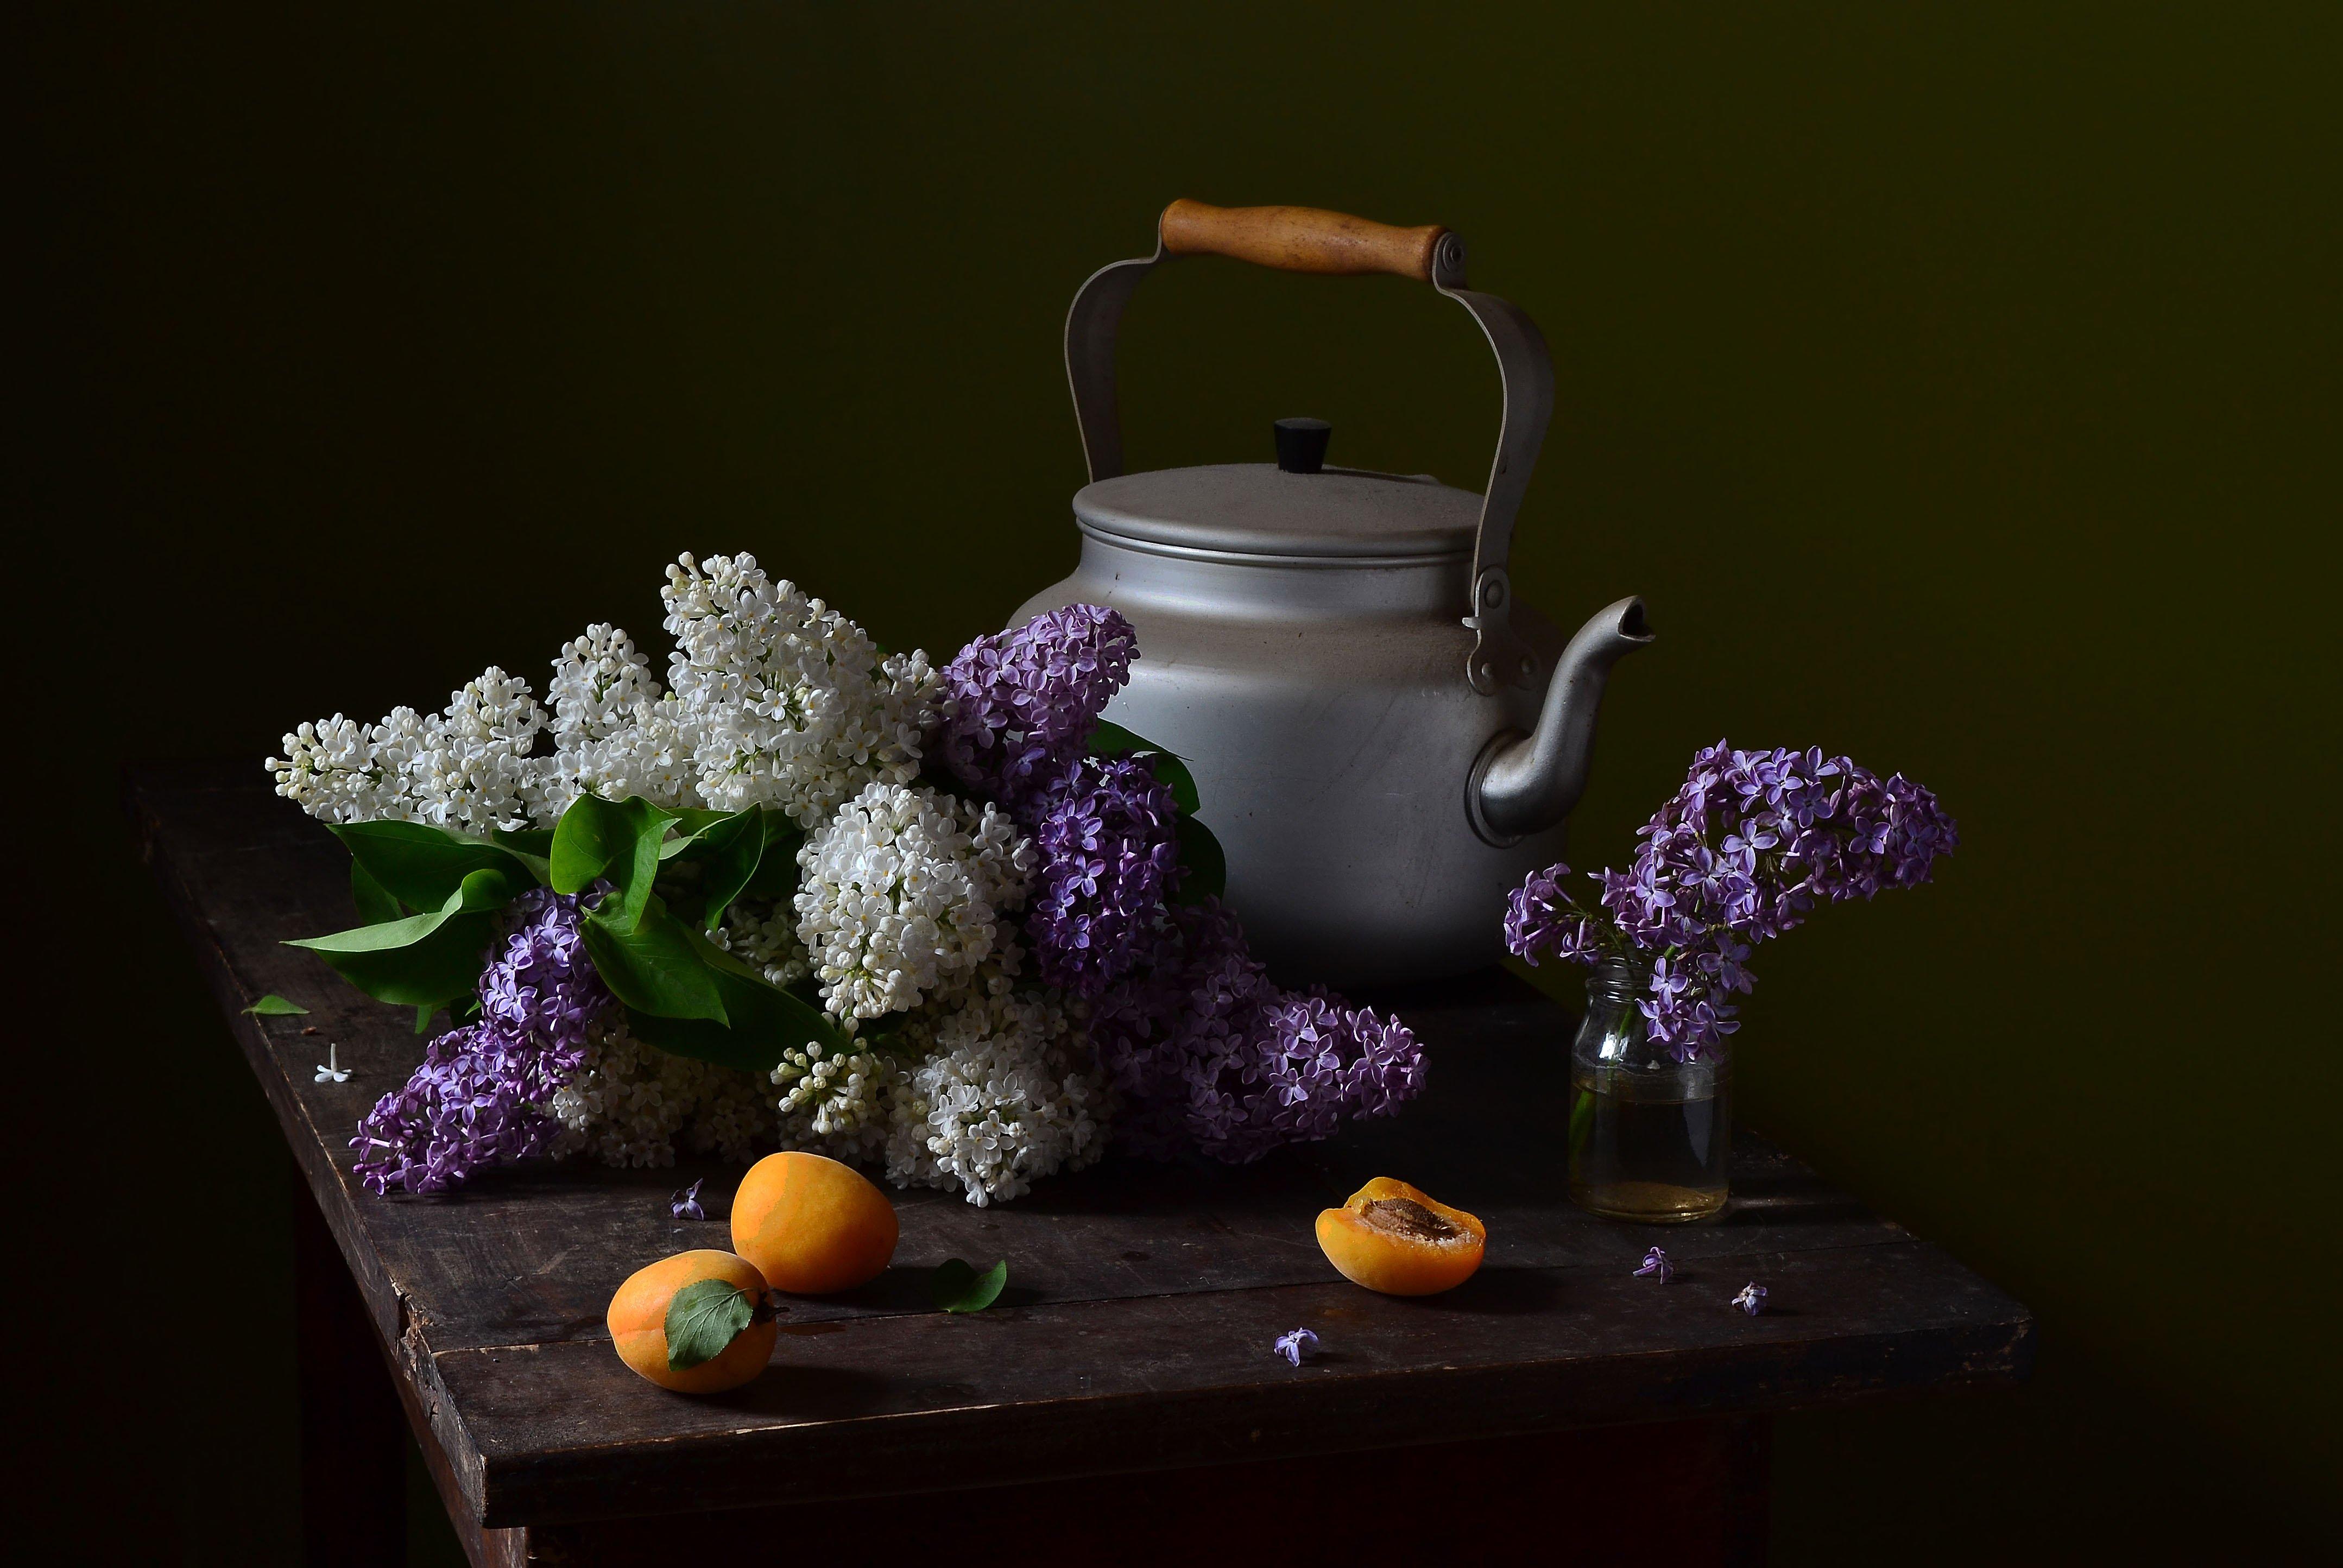 чайник, сирень, букет, стол, абрикос, баночка, июнь, Оксана Евкодимова